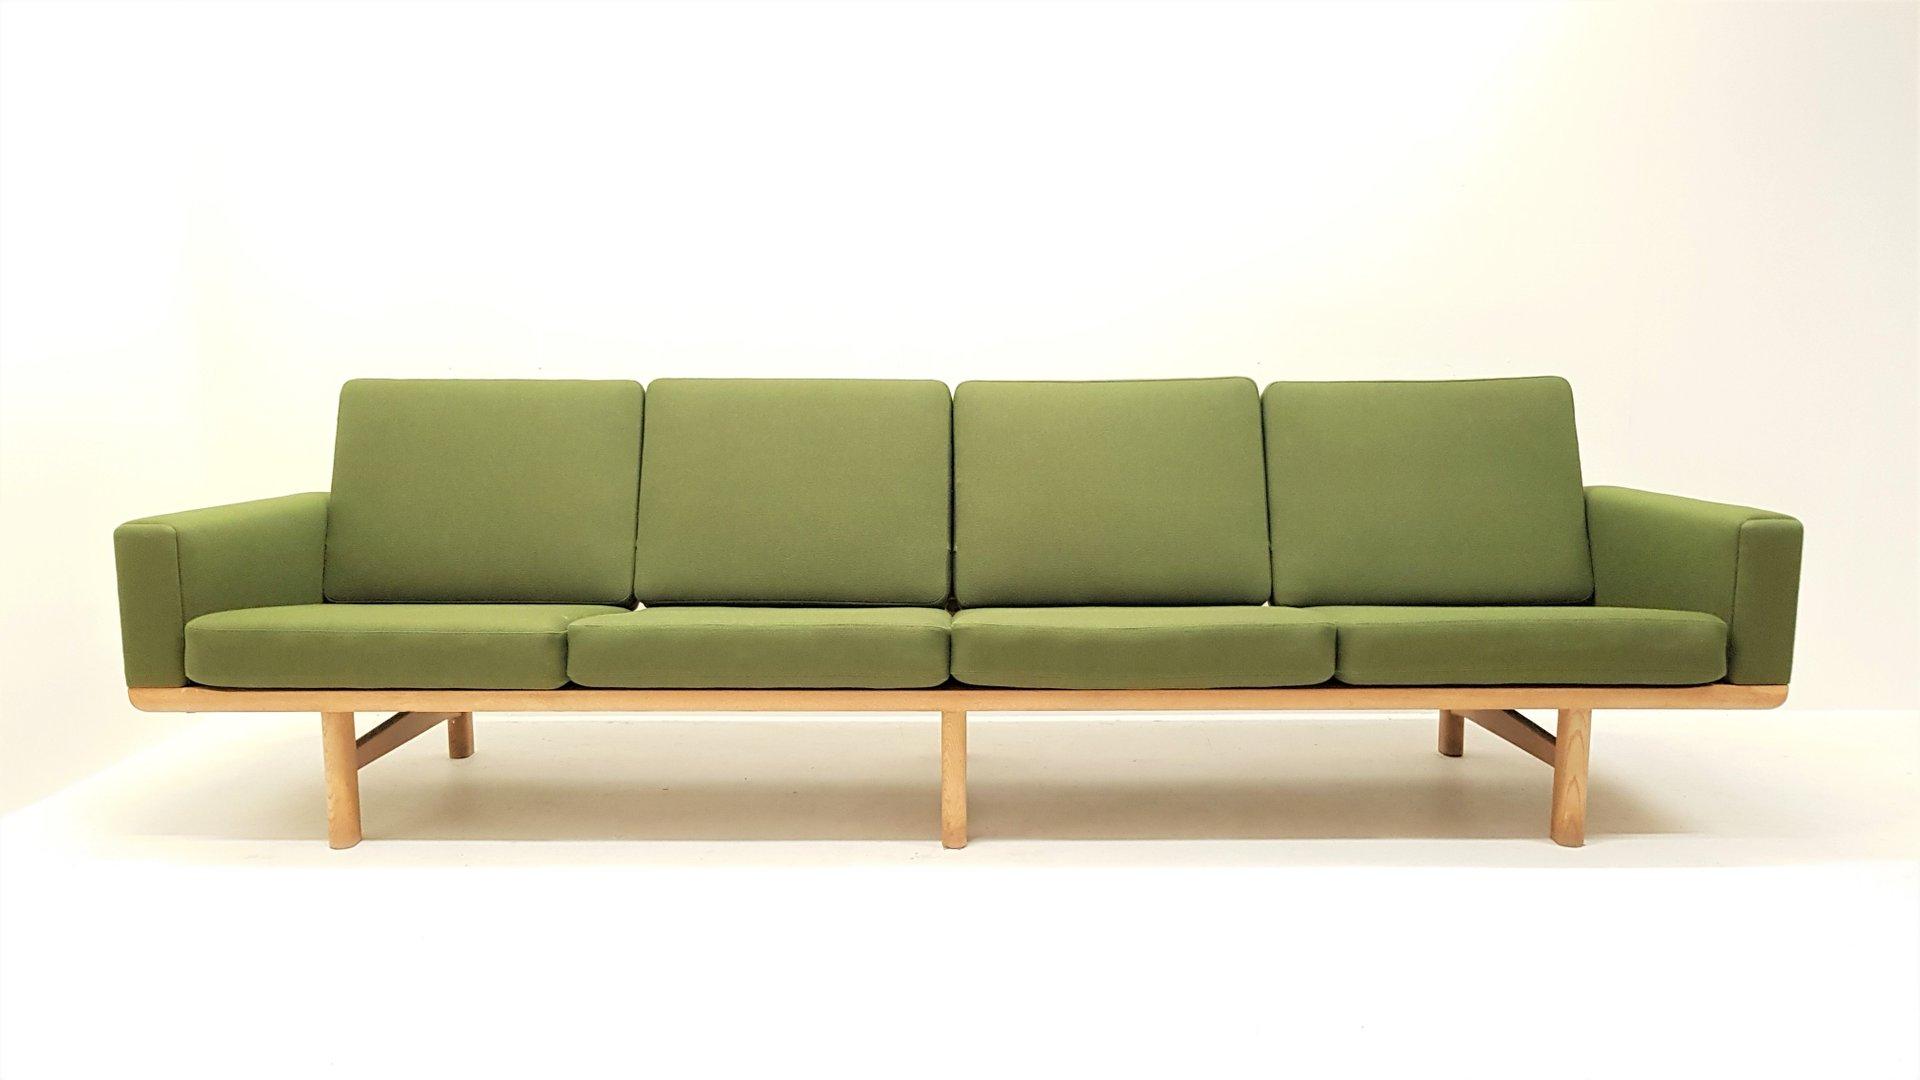 Mid Century GE 236 4 4 Seater Sofa by Hans J Wegner for Getama